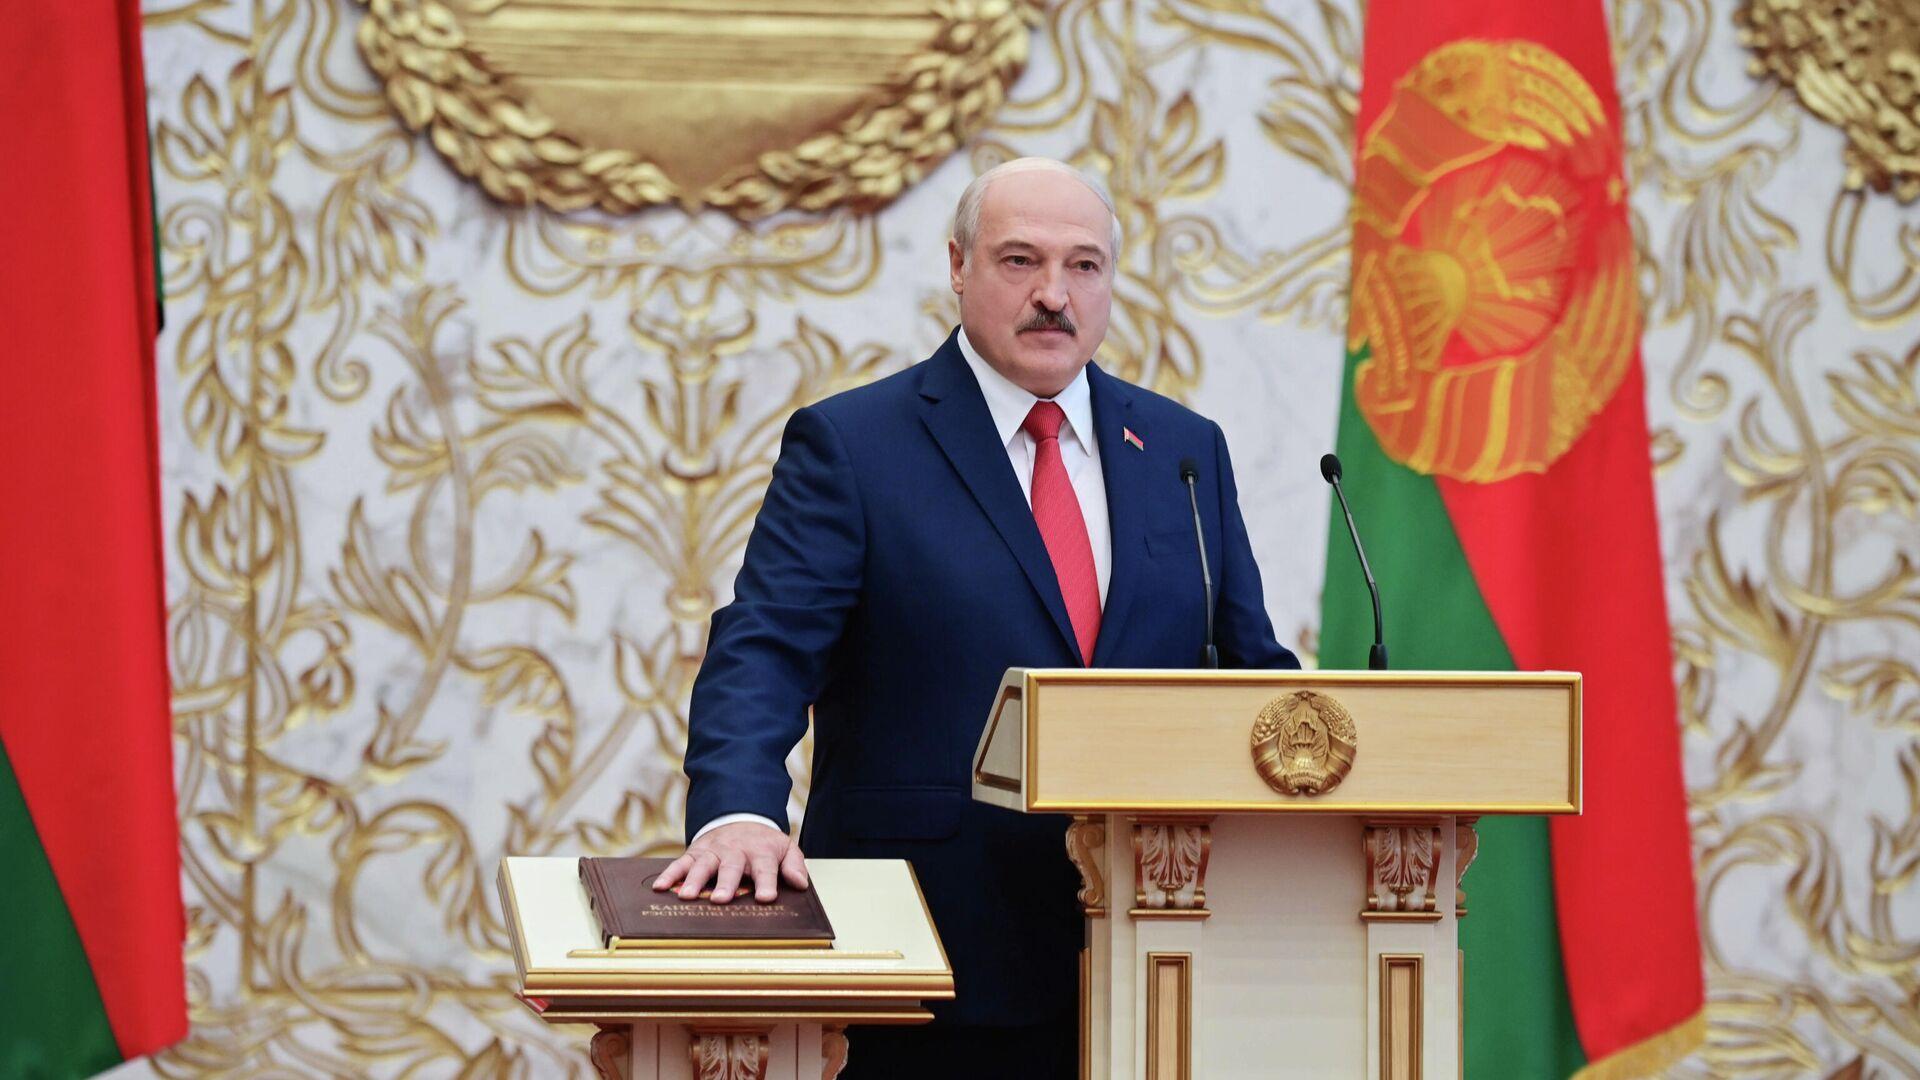 Президент Белоруссии Александр Лукашенко на церемонии инаугурации в Минске - РИА Новости, 1920, 25.09.2020